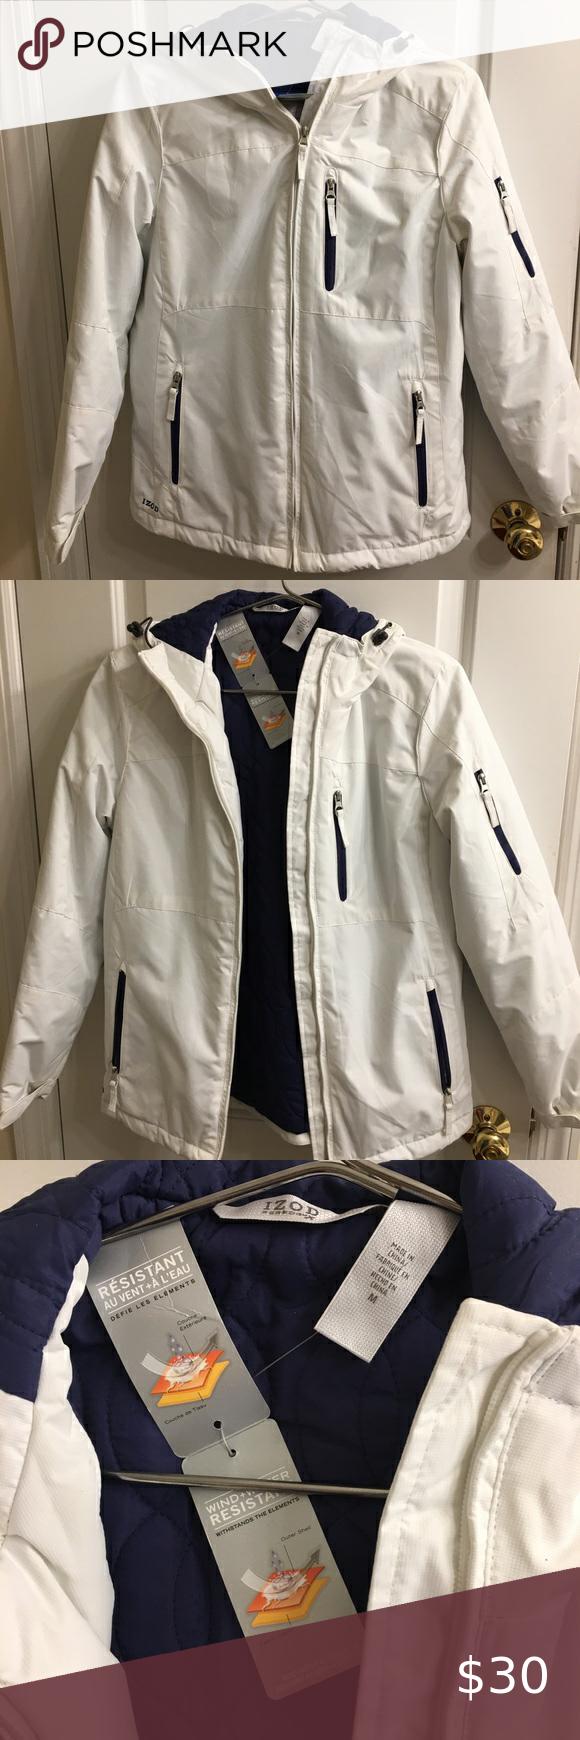 Izod Nwt Performx Wind Water Resistant Coat M Water Resistant Coats Clothes Design Izod [ 1740 x 580 Pixel ]